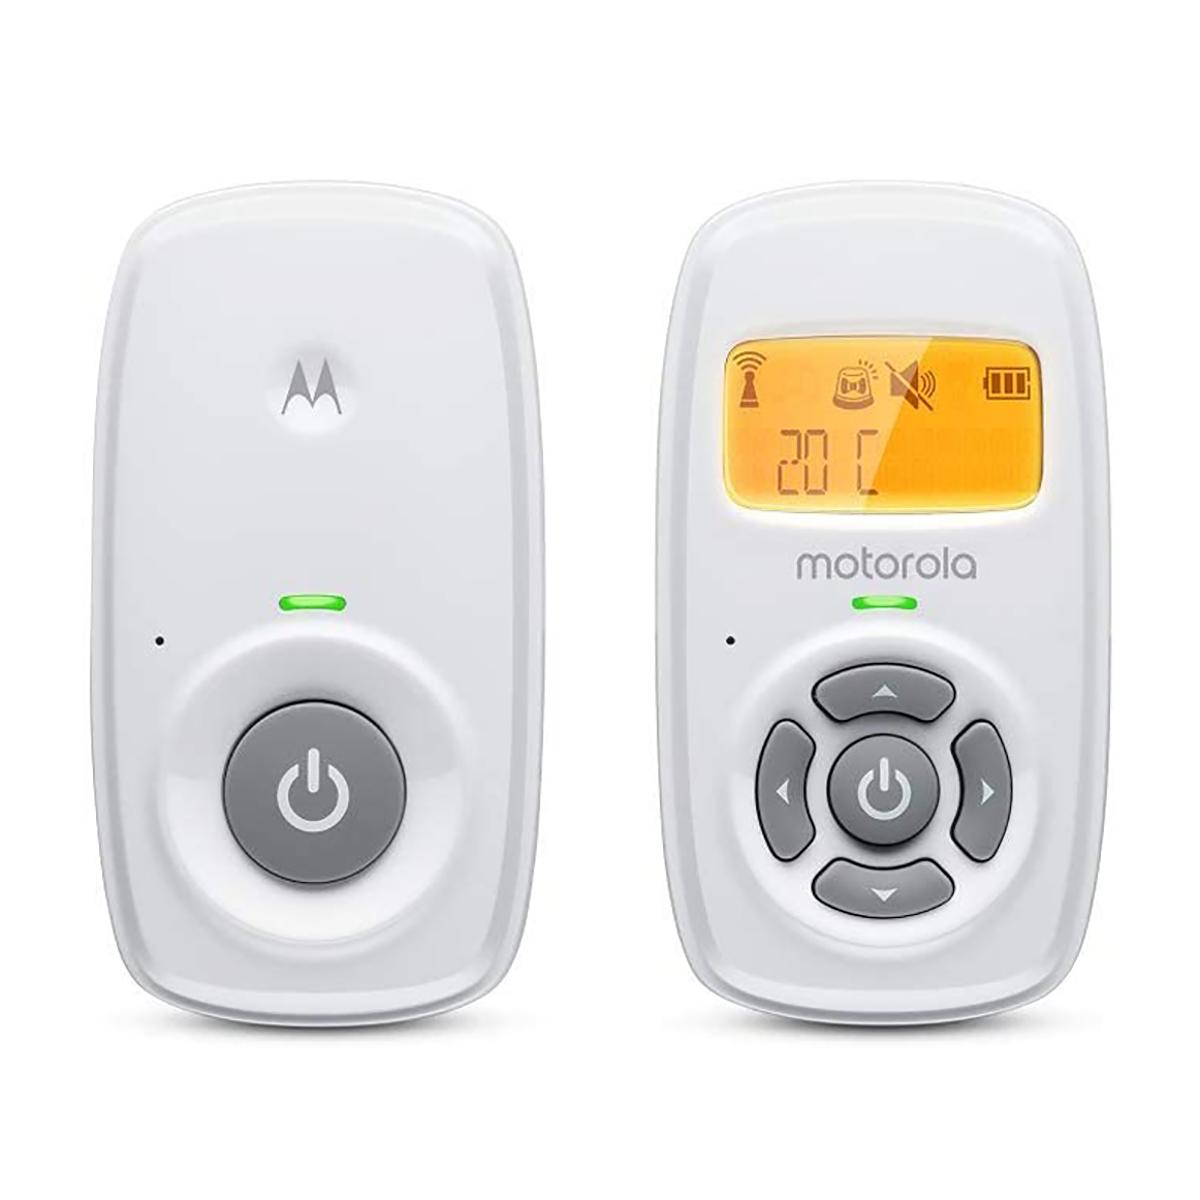 Audio Monitor Digital Motorola MBP24 imagine 2021